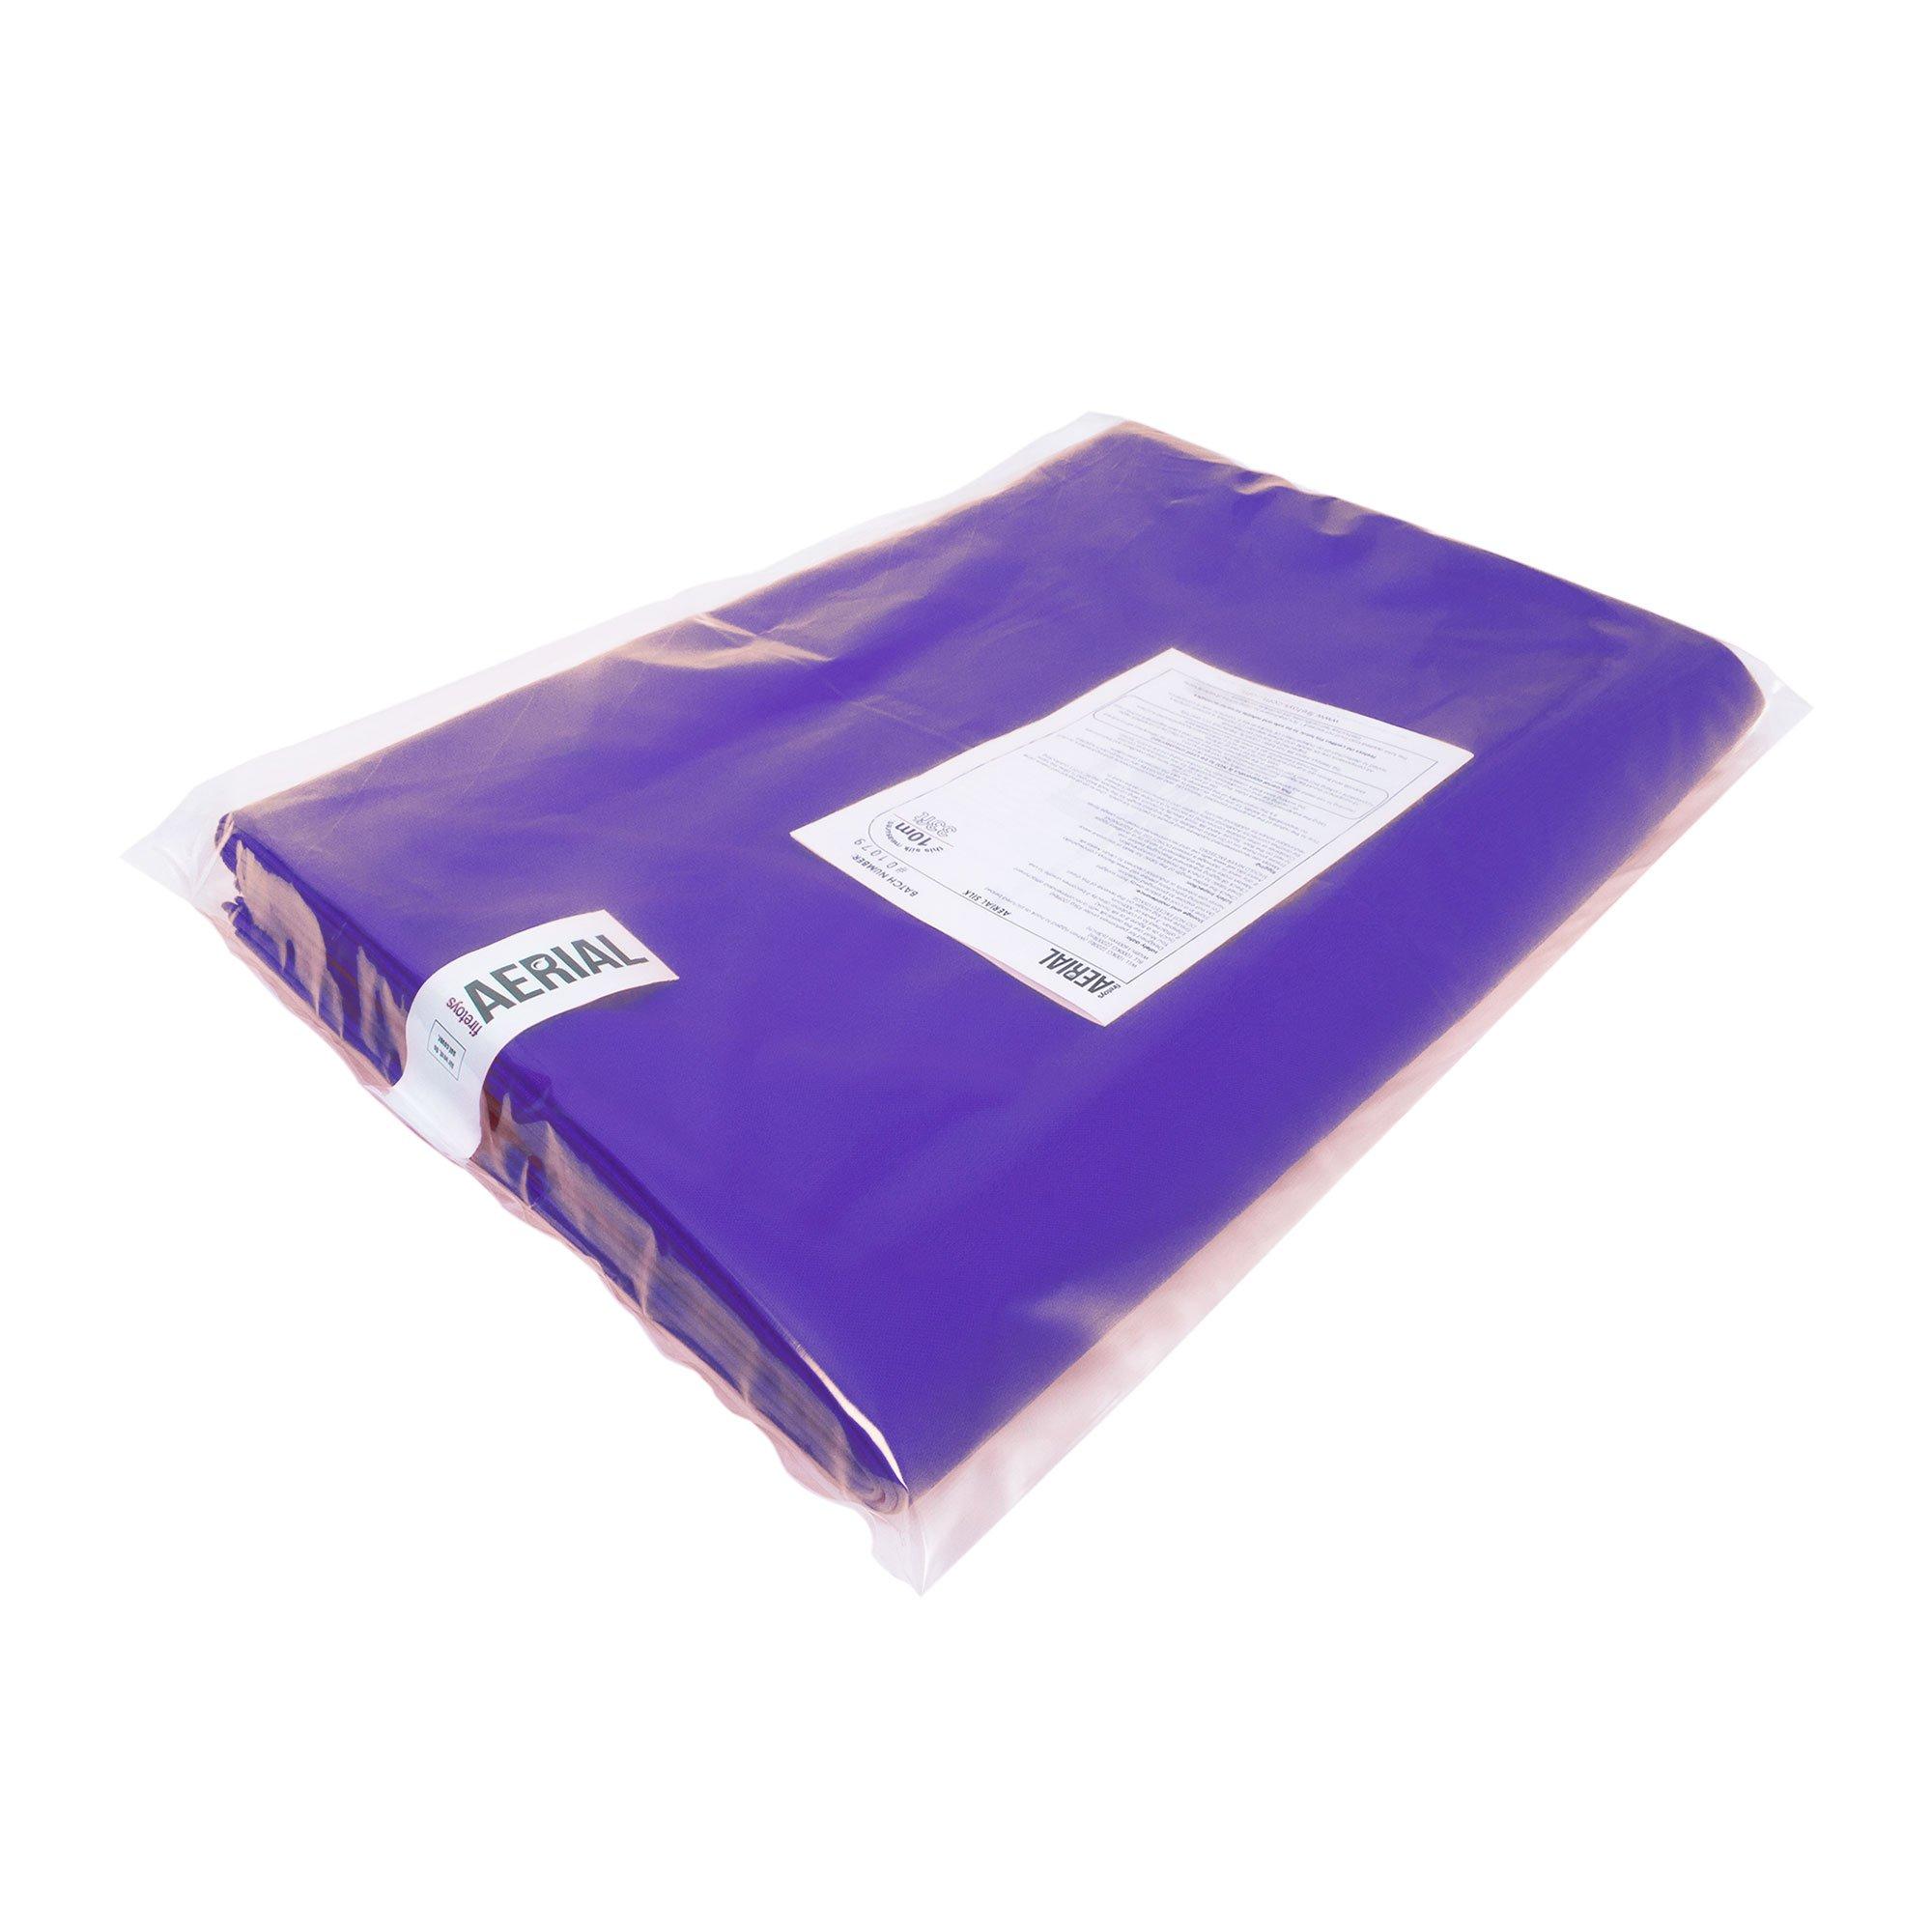 Firetoys Aerial Silk (Aerial Fabric Fabric Fabric / Tissus) - lila-14 metres 4aa0e3